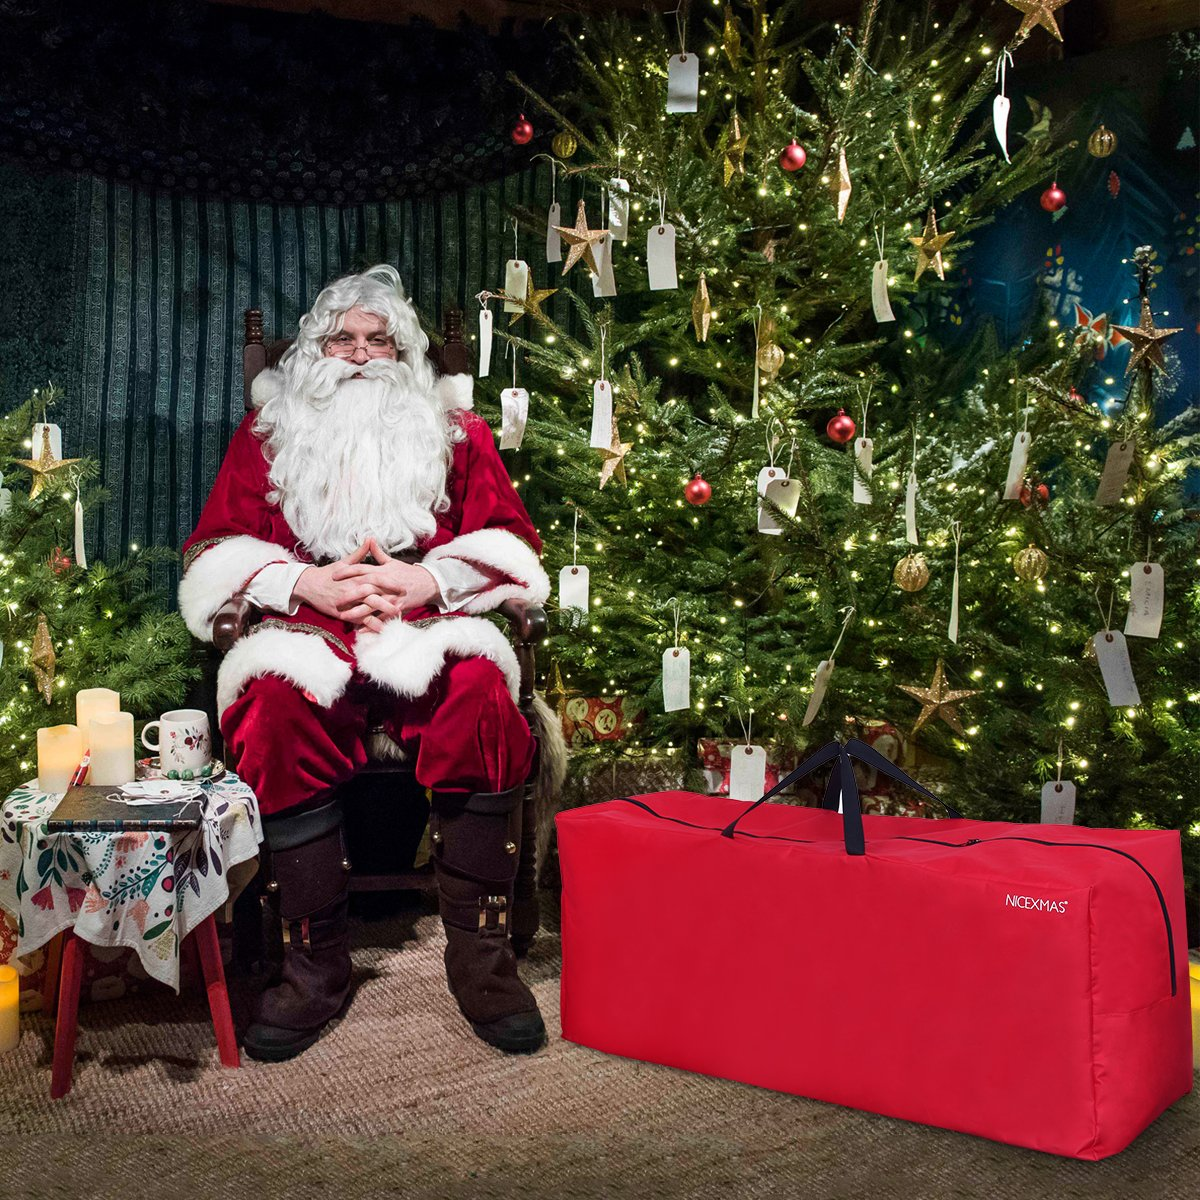 BESTOMZ Bolsa de almacenamiento para /árboles de Navidad con asa de transporte con cremallera Bolsa para /árbol de adornos navide/ños con guirnaldas de luces rojo